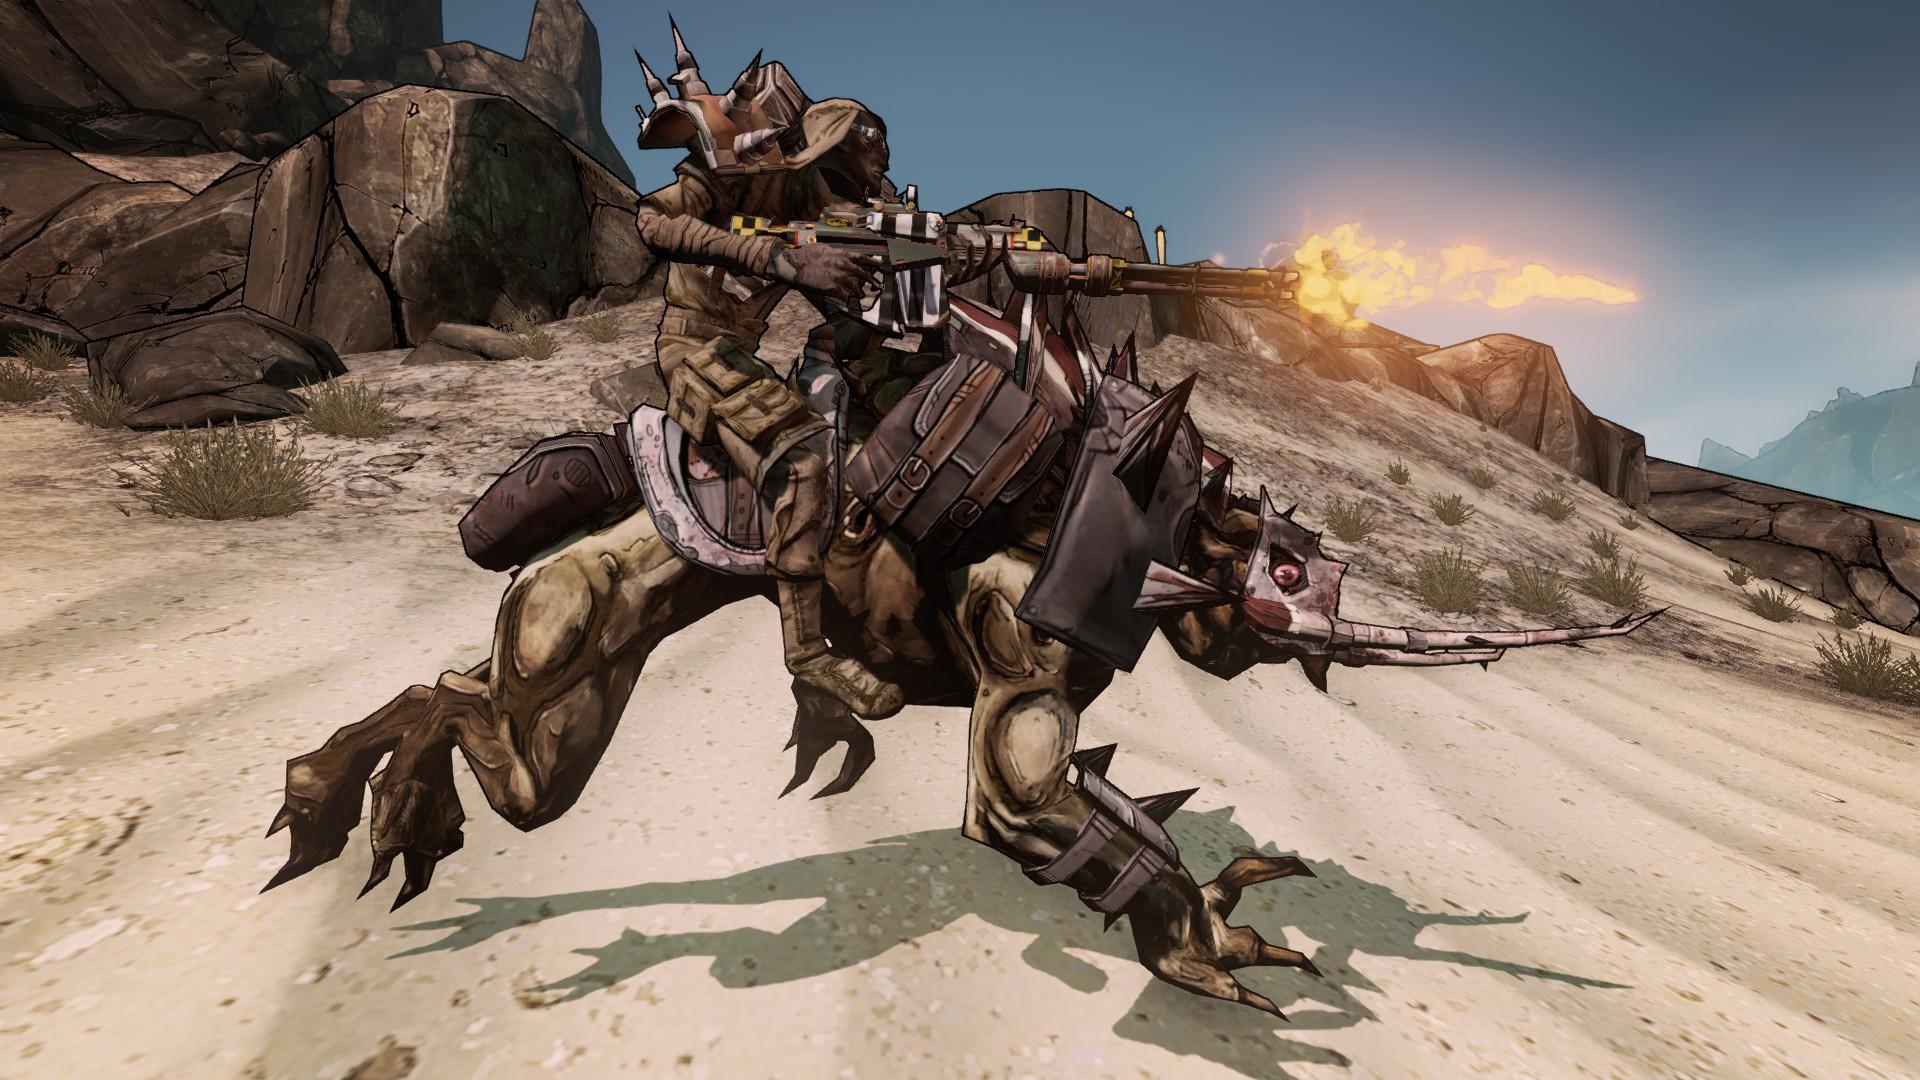 Armored Skag